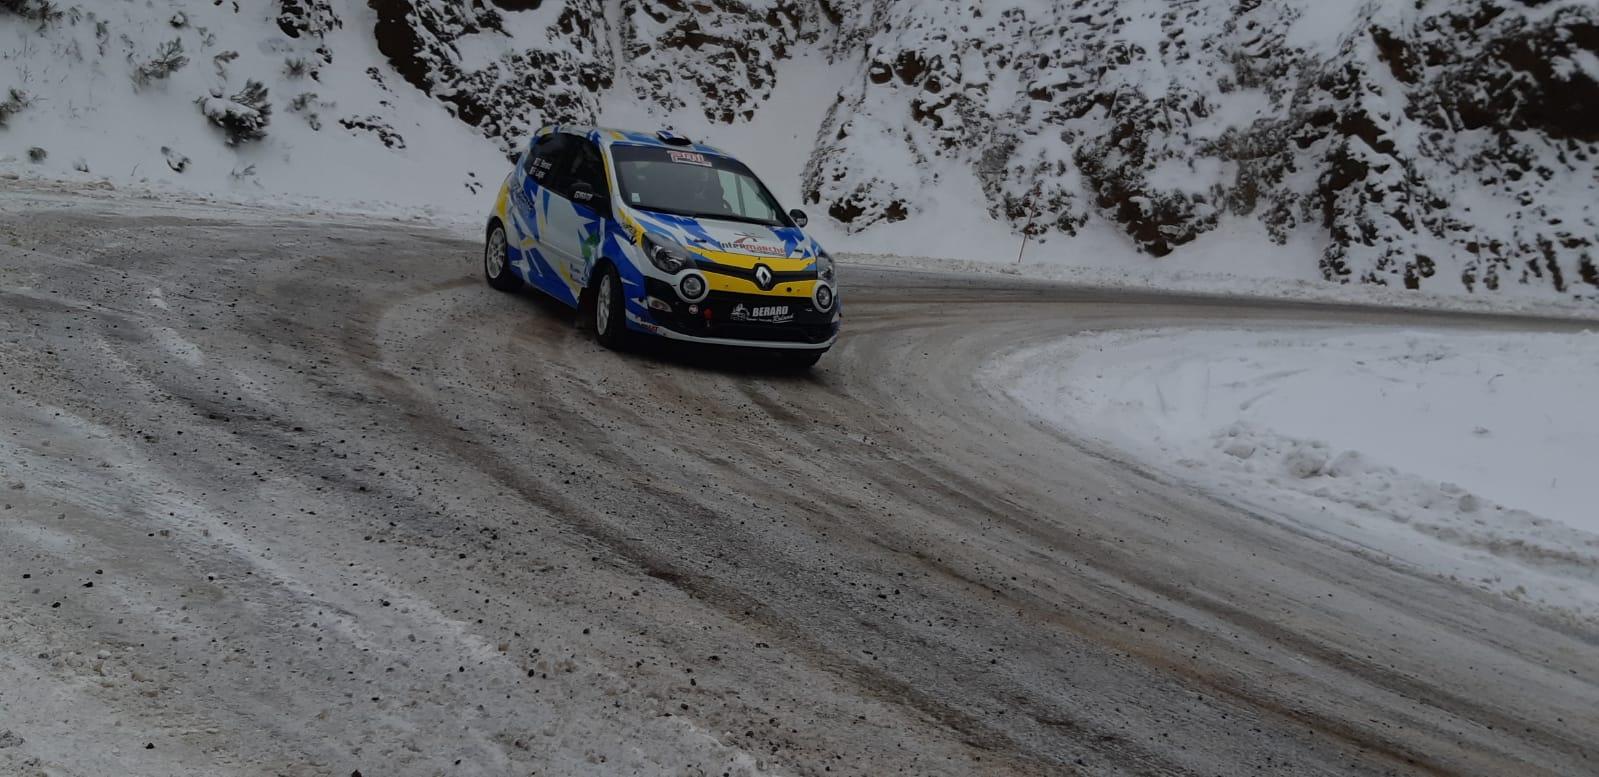 rallye de Monte-Carlo David Berard et Frederic Lager 1ere journée 220121 reactions